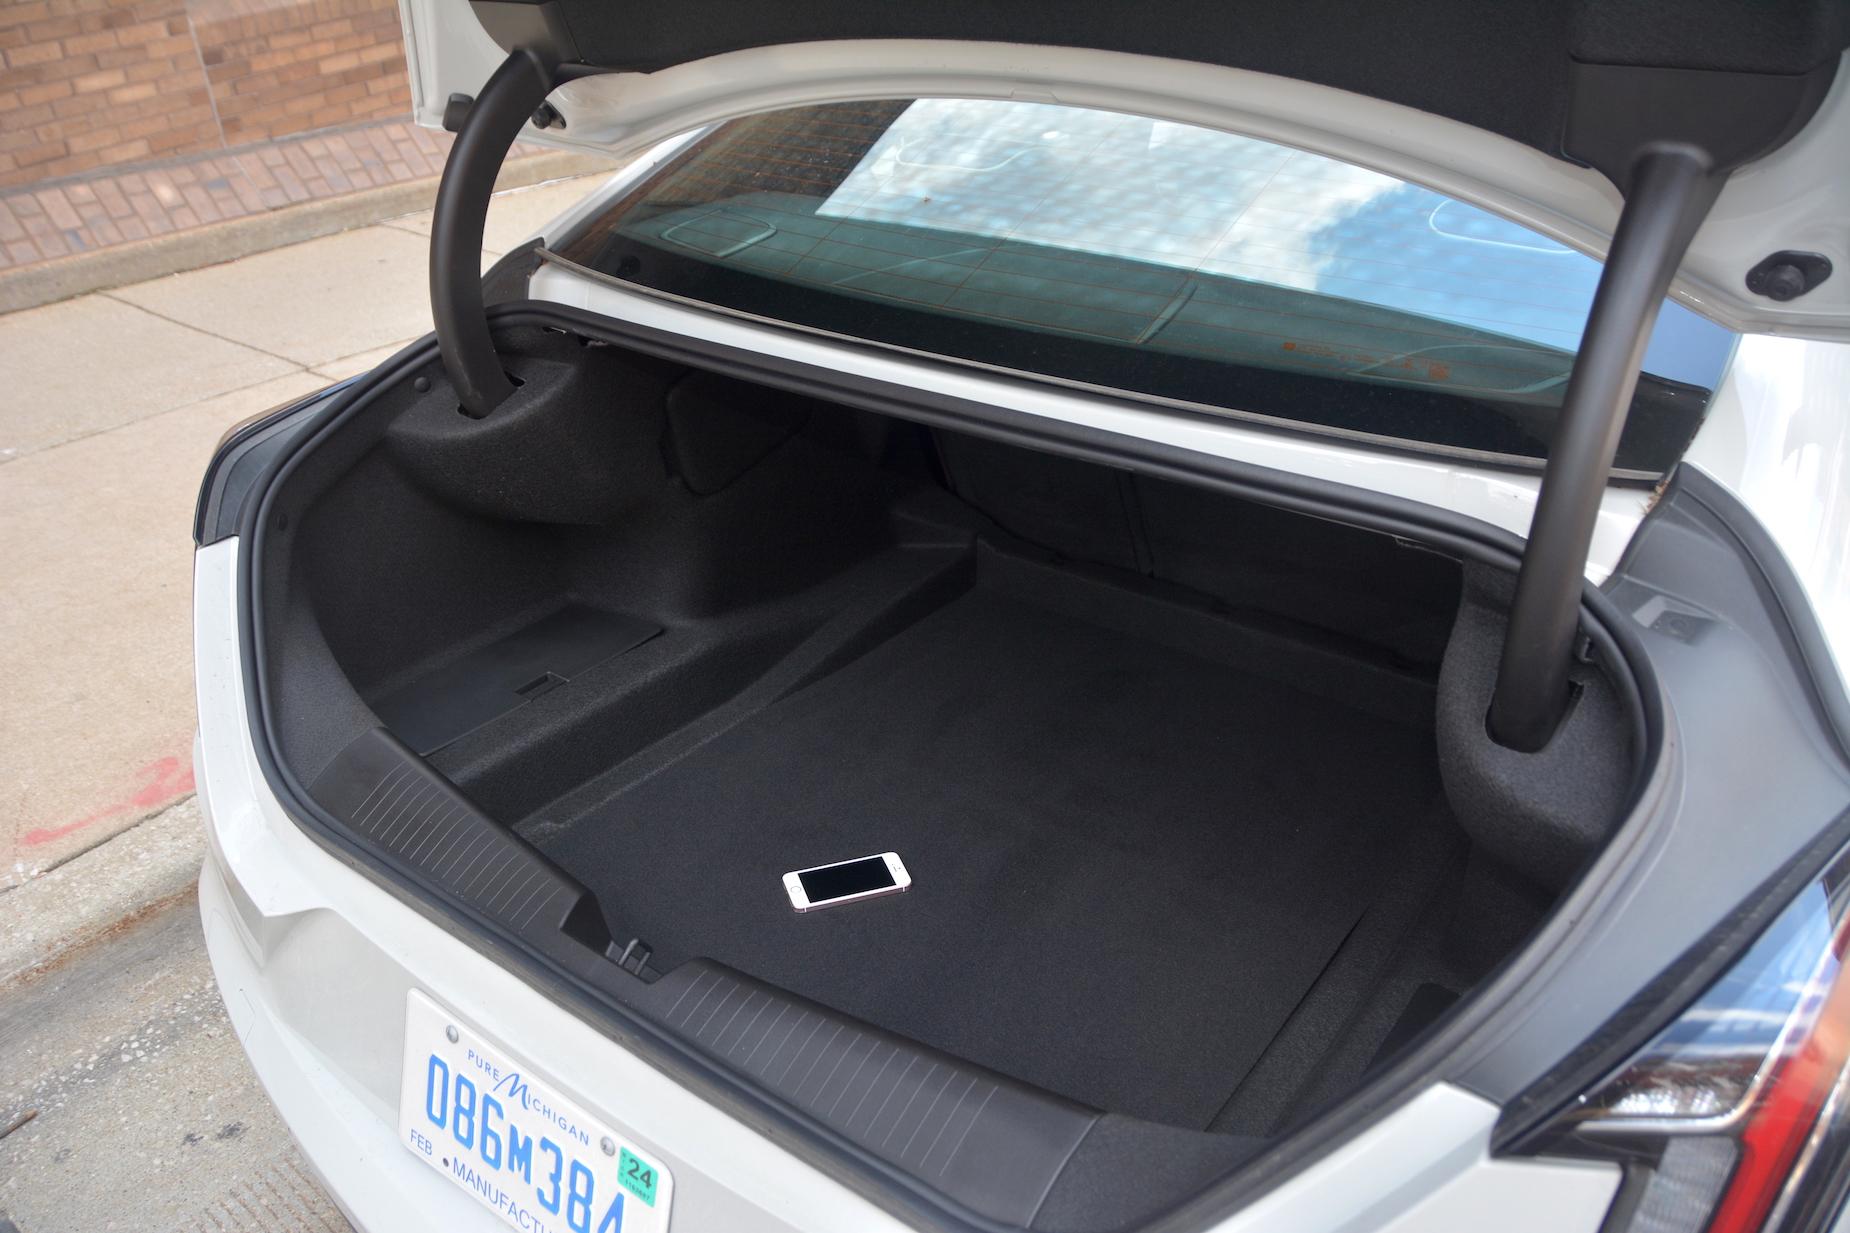 2021 Cadillac CT4-V trunk